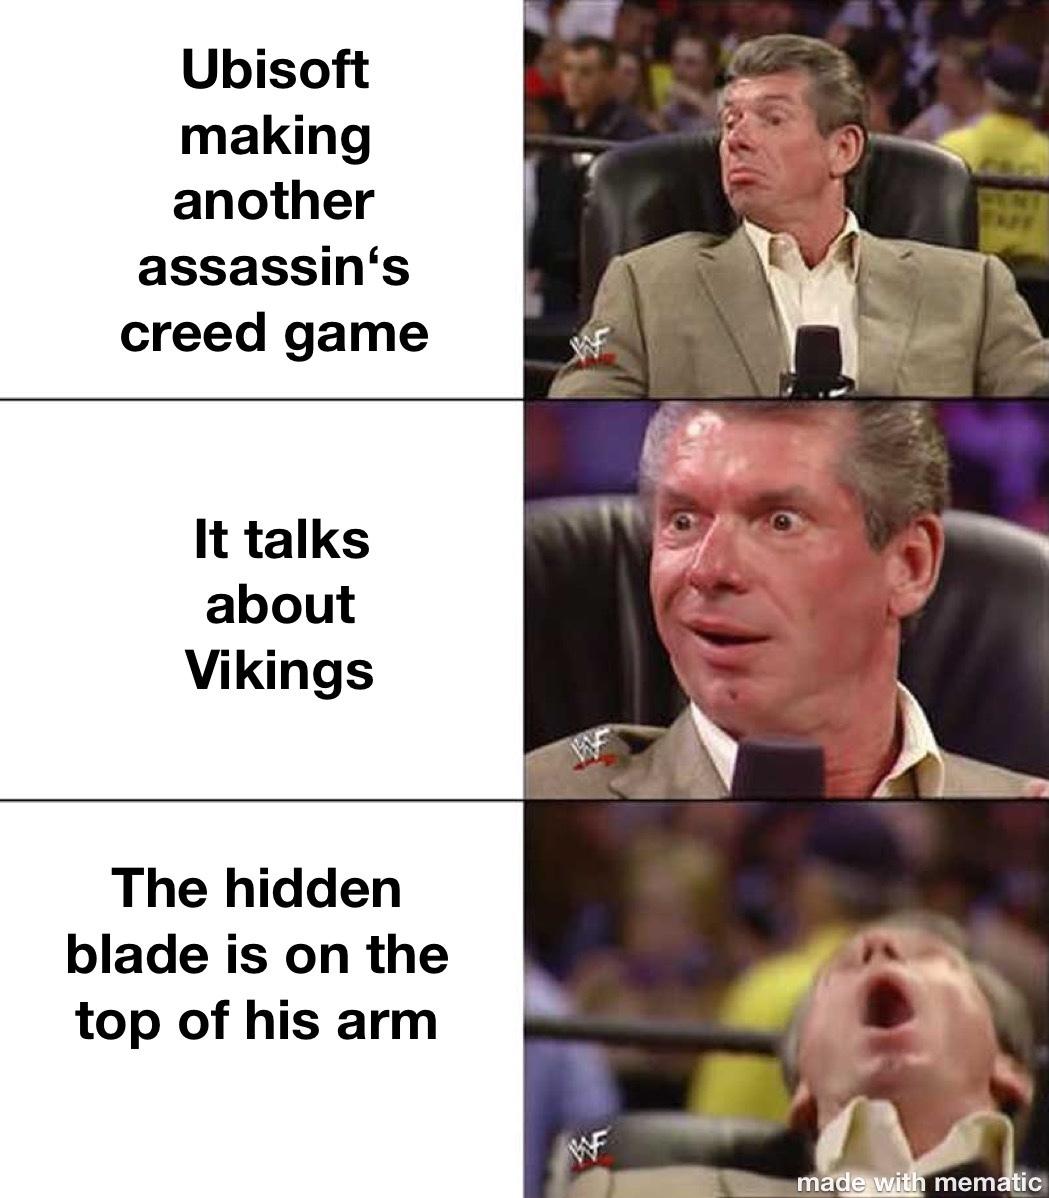 assassins creed - meme